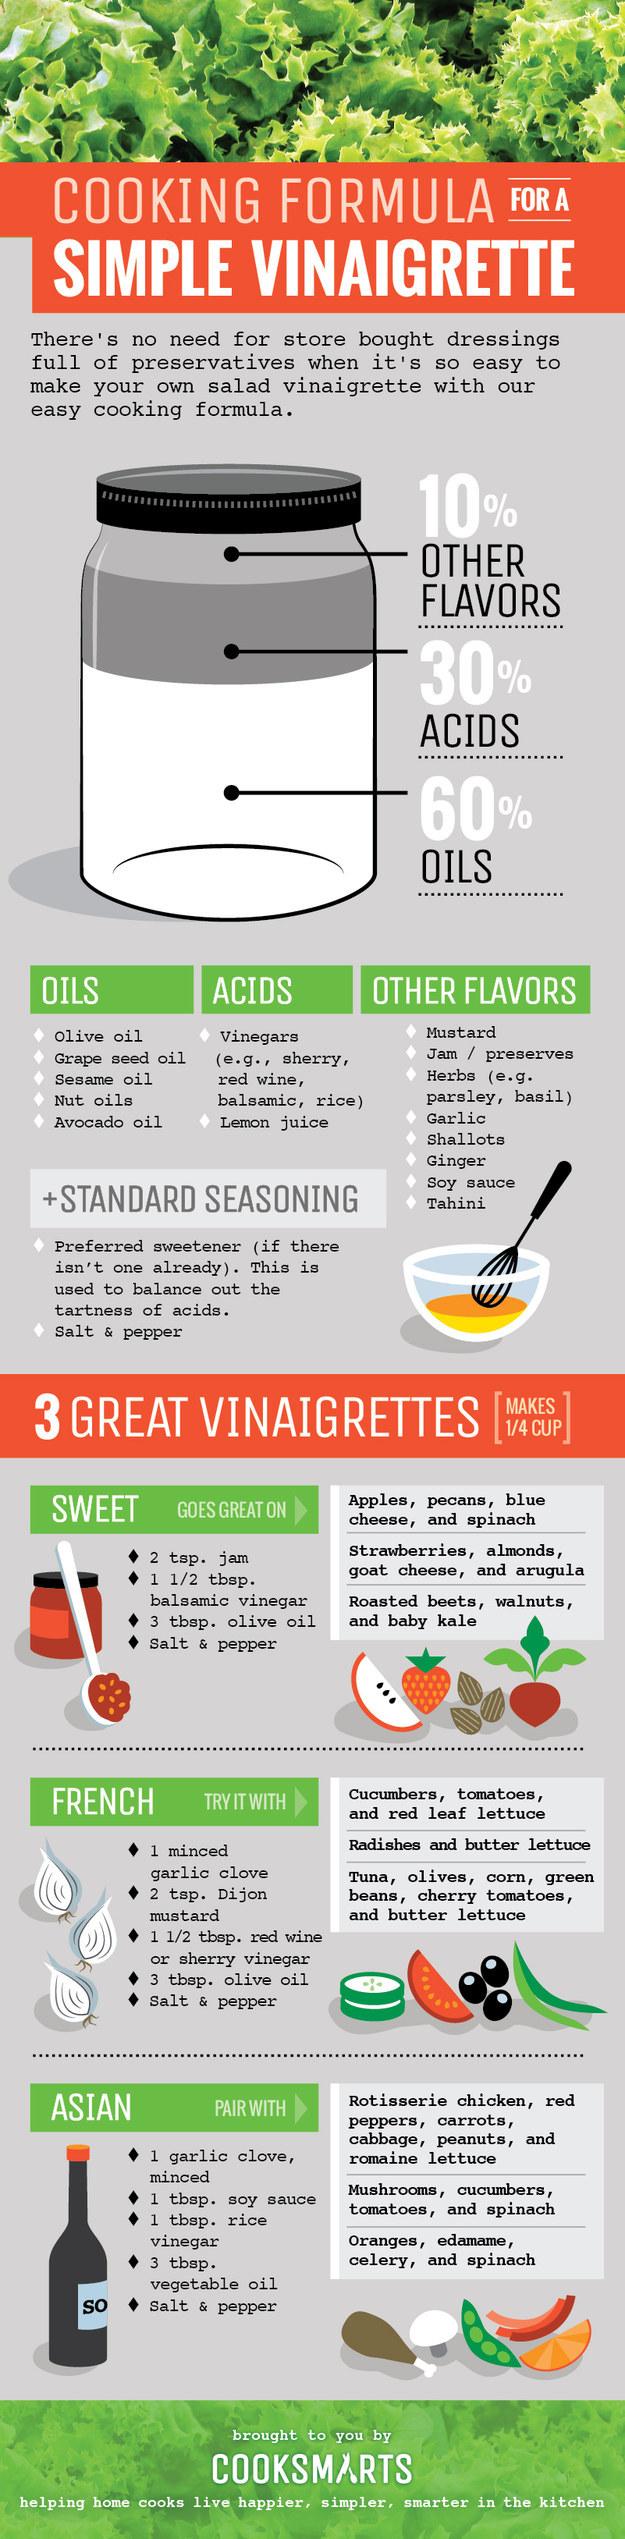 how to make alcohol vinaigrette